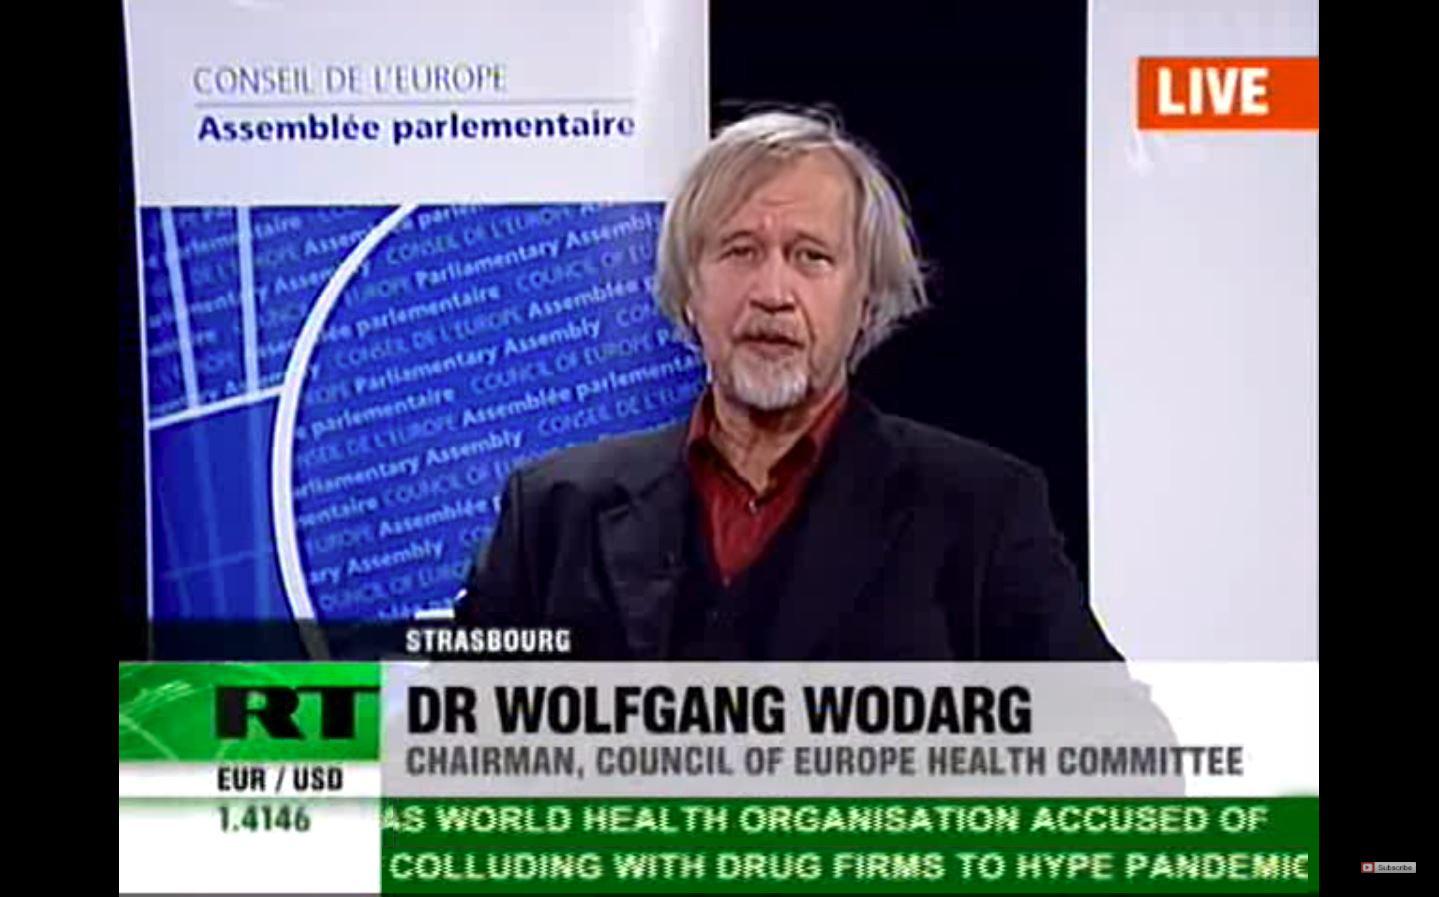 Wolfgang Wodarg: Swine flu, Bird flu 'never happened' - Probe into H1N1  'false pandemic'  